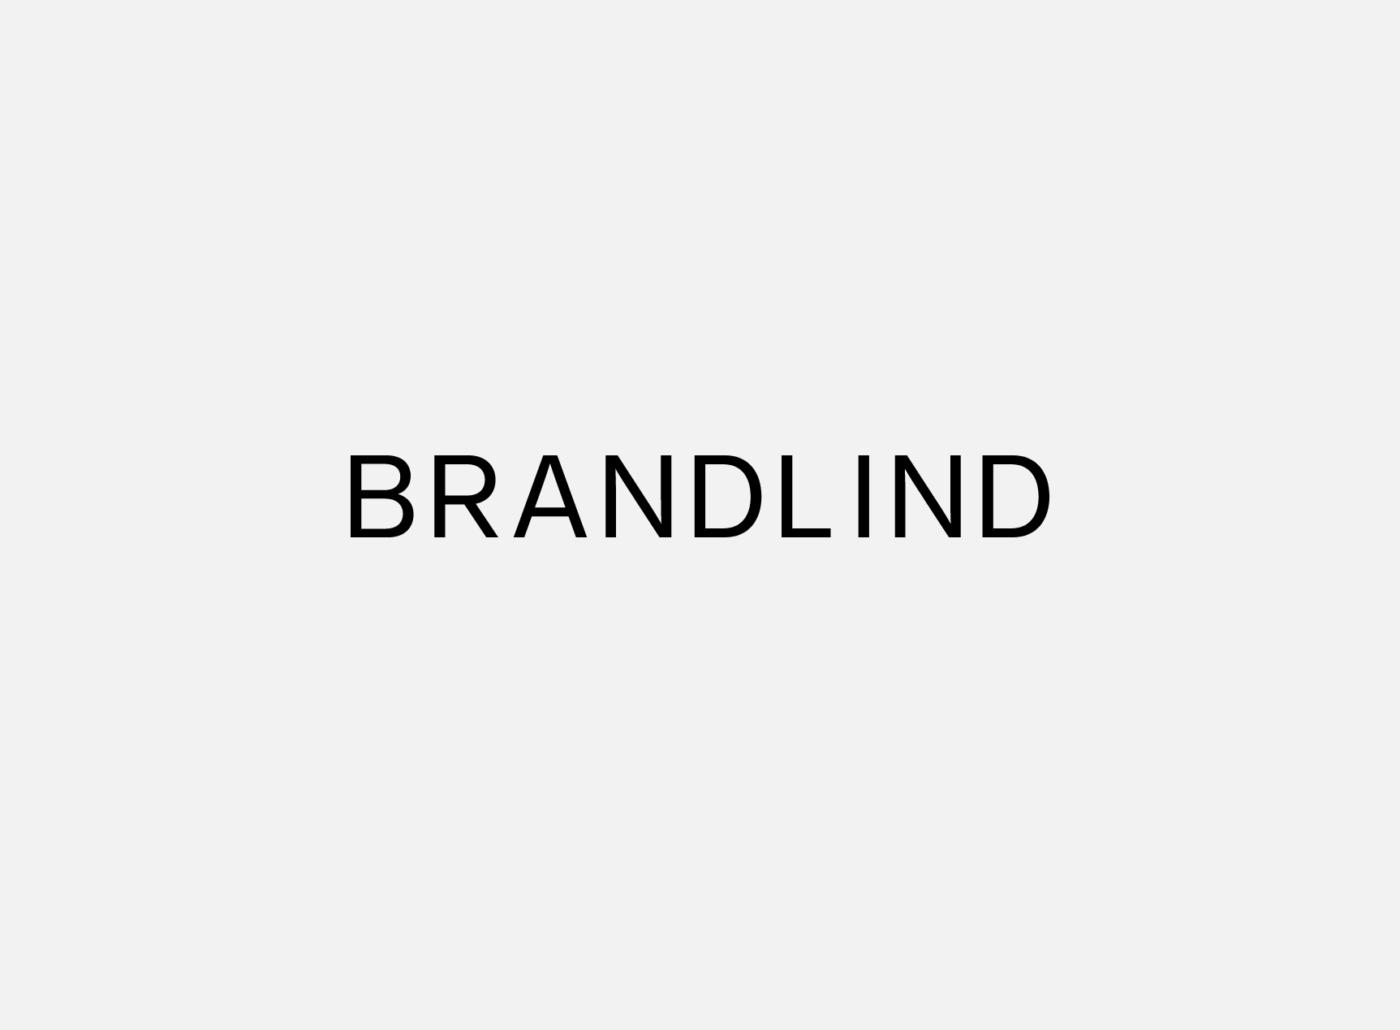 Brandlind logo by TAC